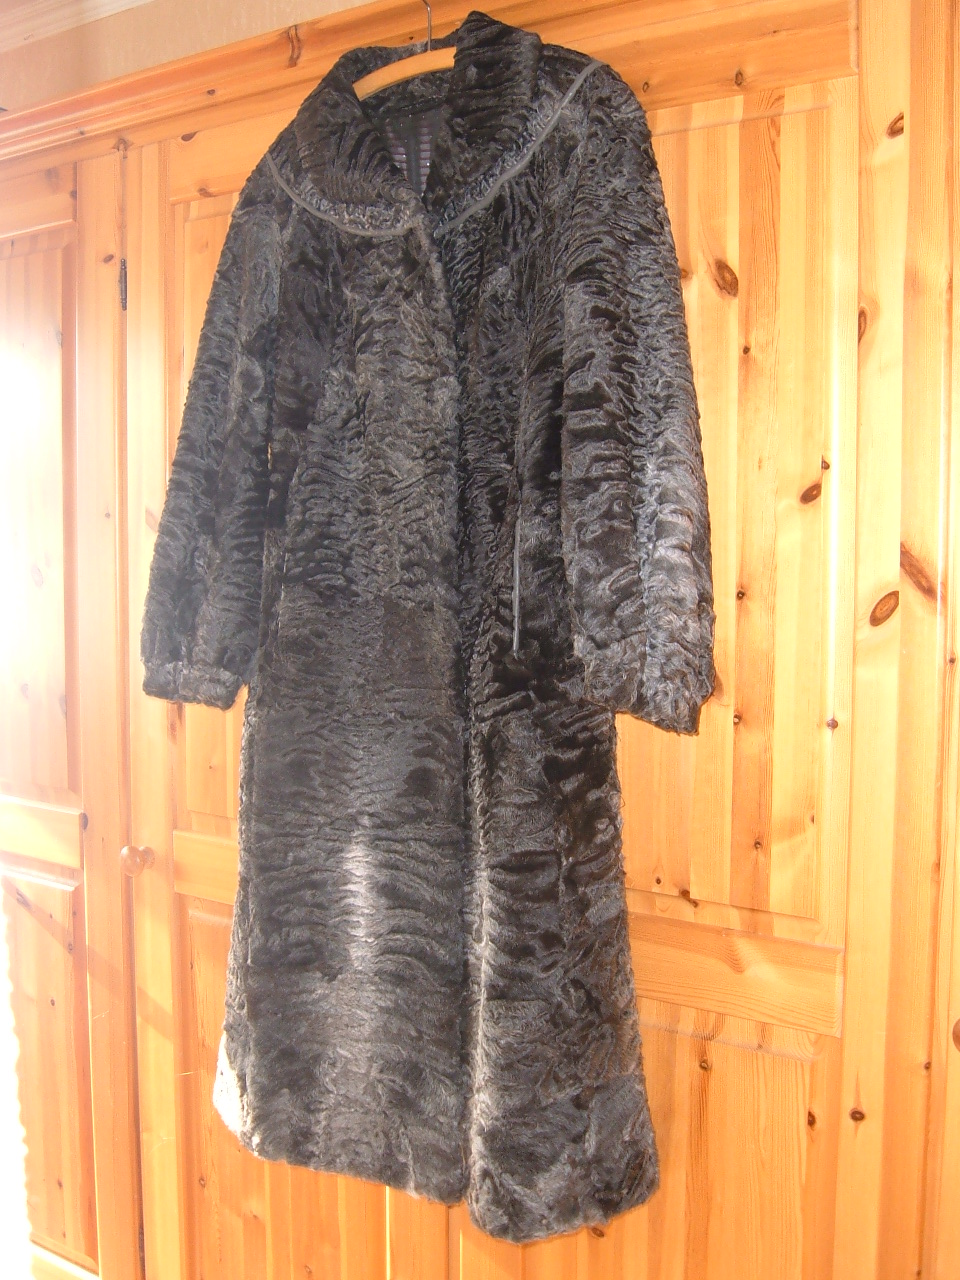 Schwarzer persianer mantel